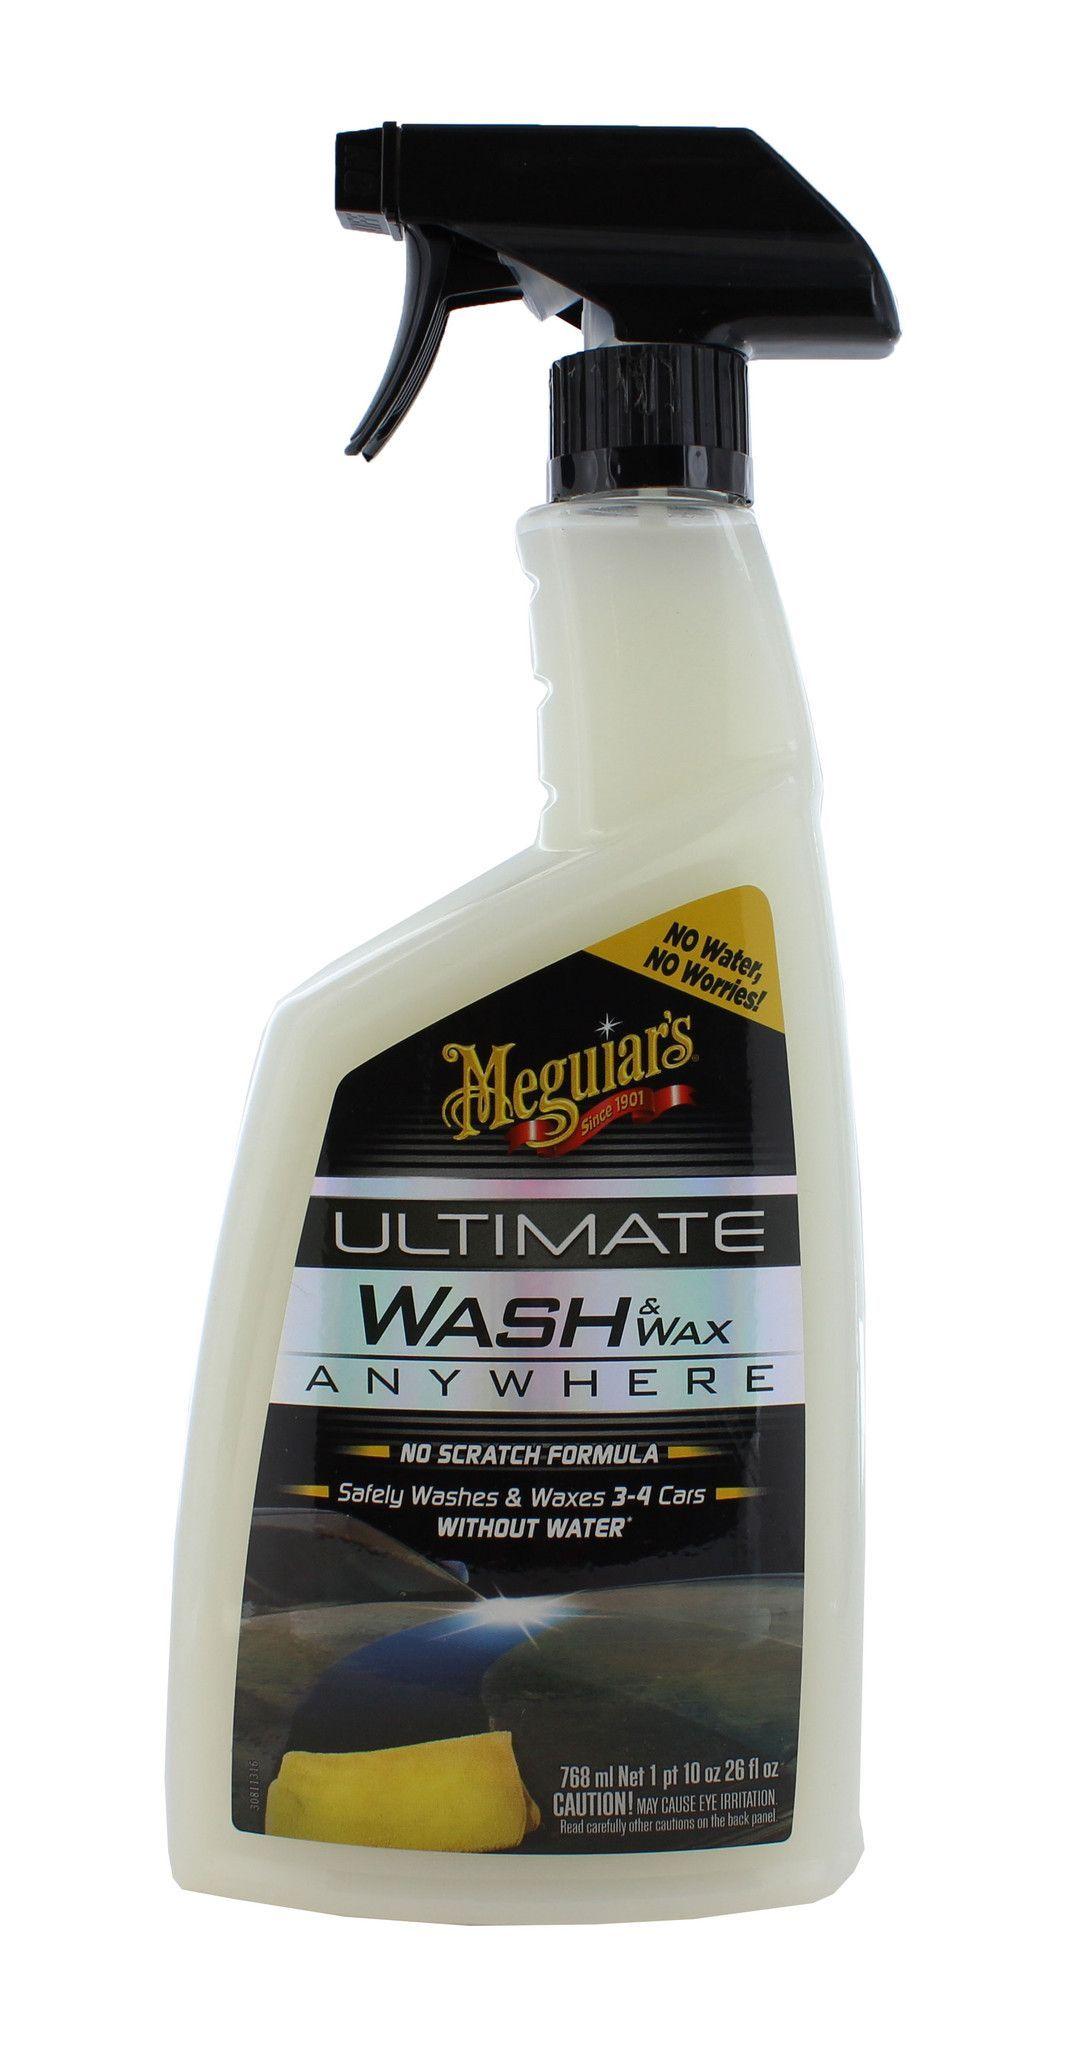 Meguiars G3626 Ultimate Wash & Wax Anywhere Spray 26 oz